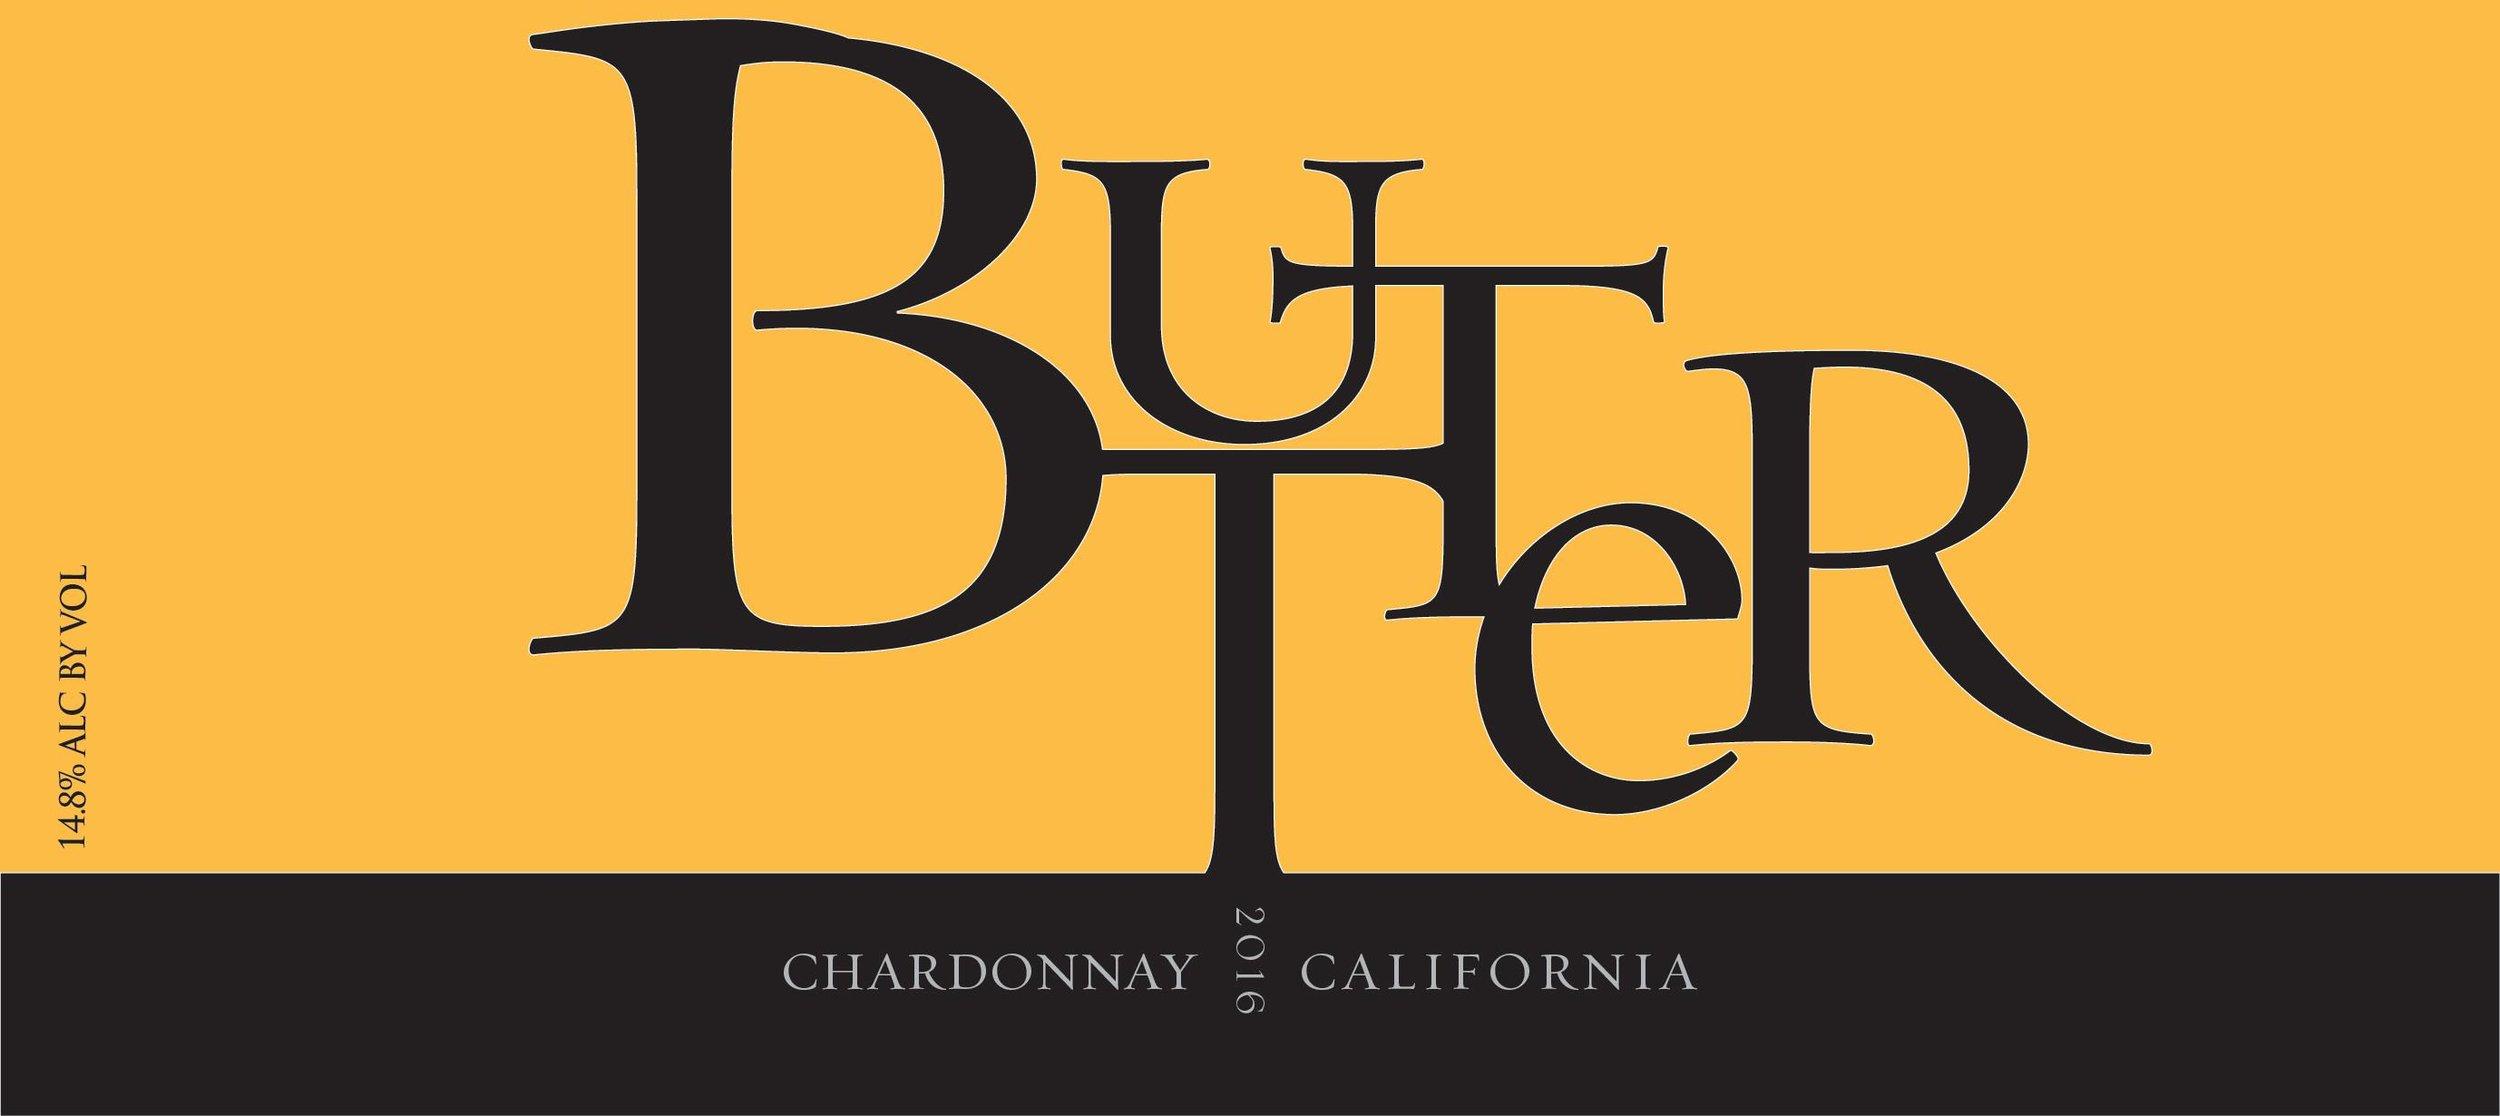 butter chardonnay.jpg